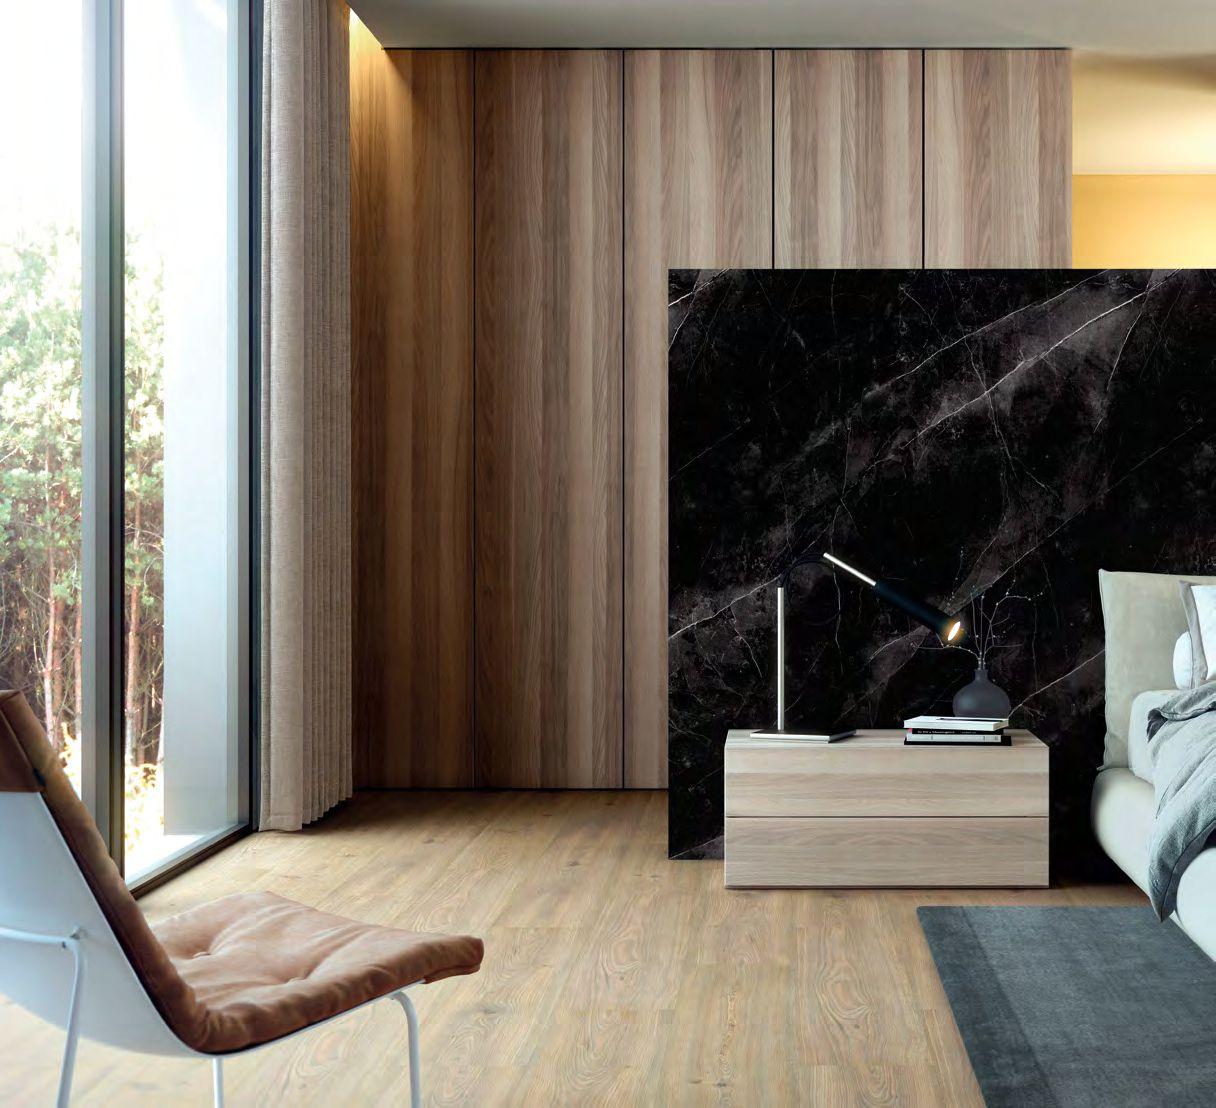 https://maderasmedina.com/wp-content/uploads/2021/03/HOTEL_img141.jpg